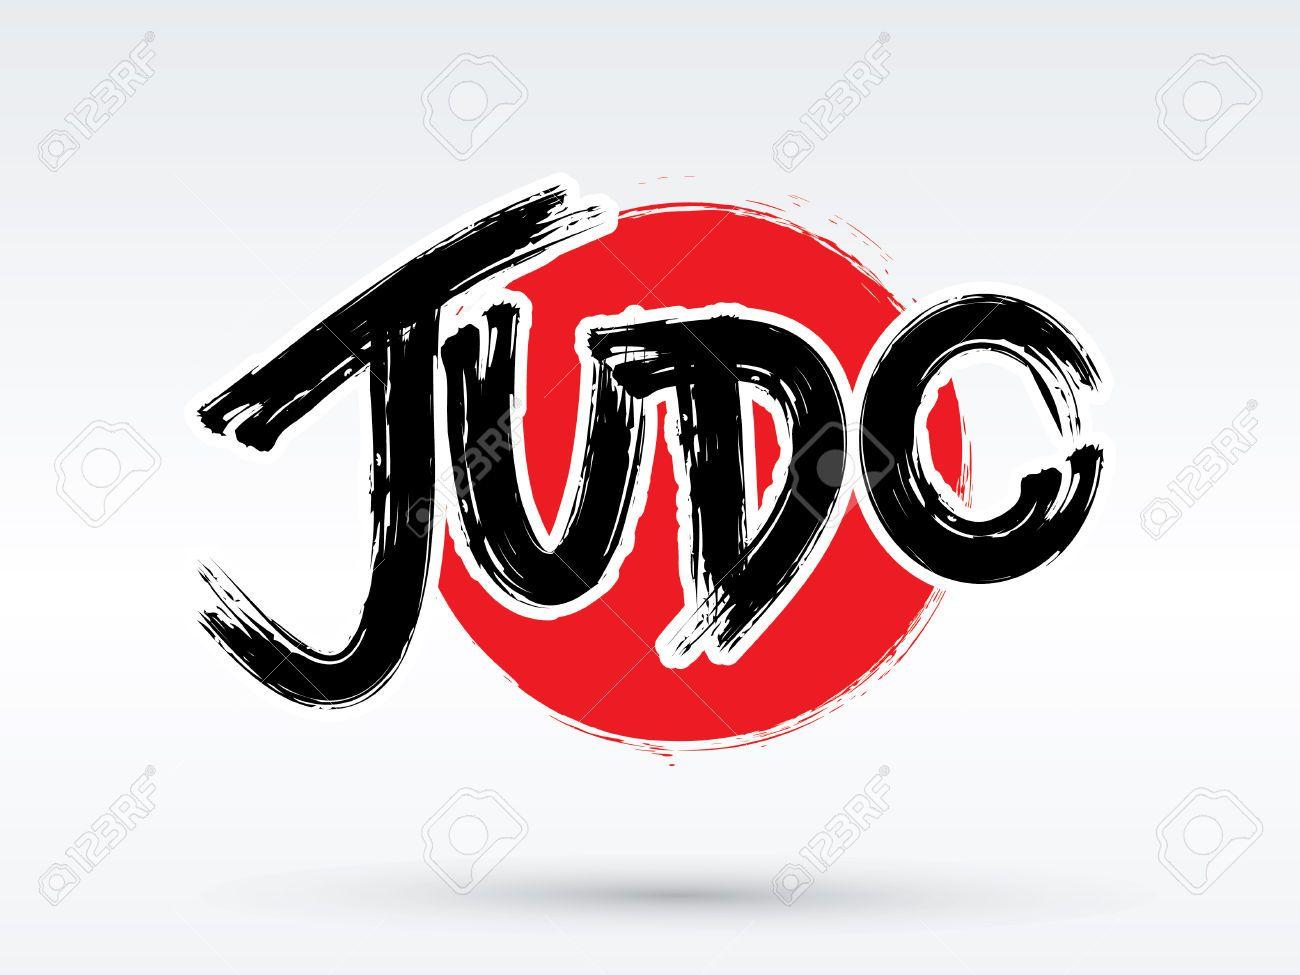 judo cepillo de texto gr u00e1fico vectorial ilustraciones karate logo design karate logo shotokan